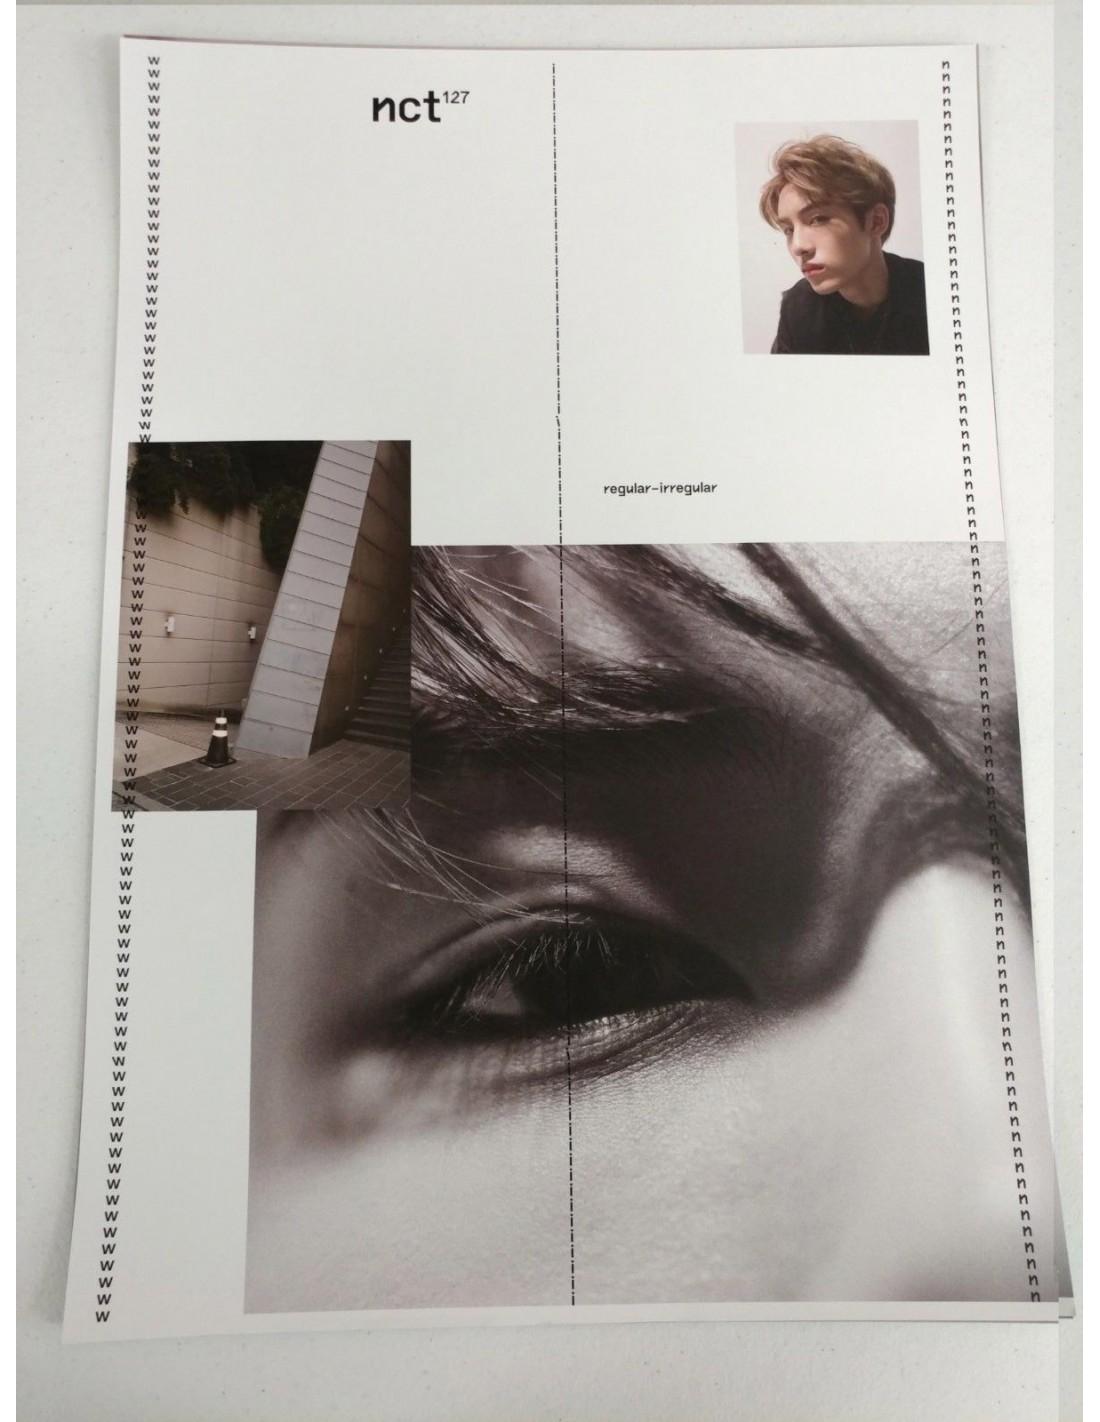 Poster SET] NCT 127 First Album Vol 1 - NCT 127 Regular